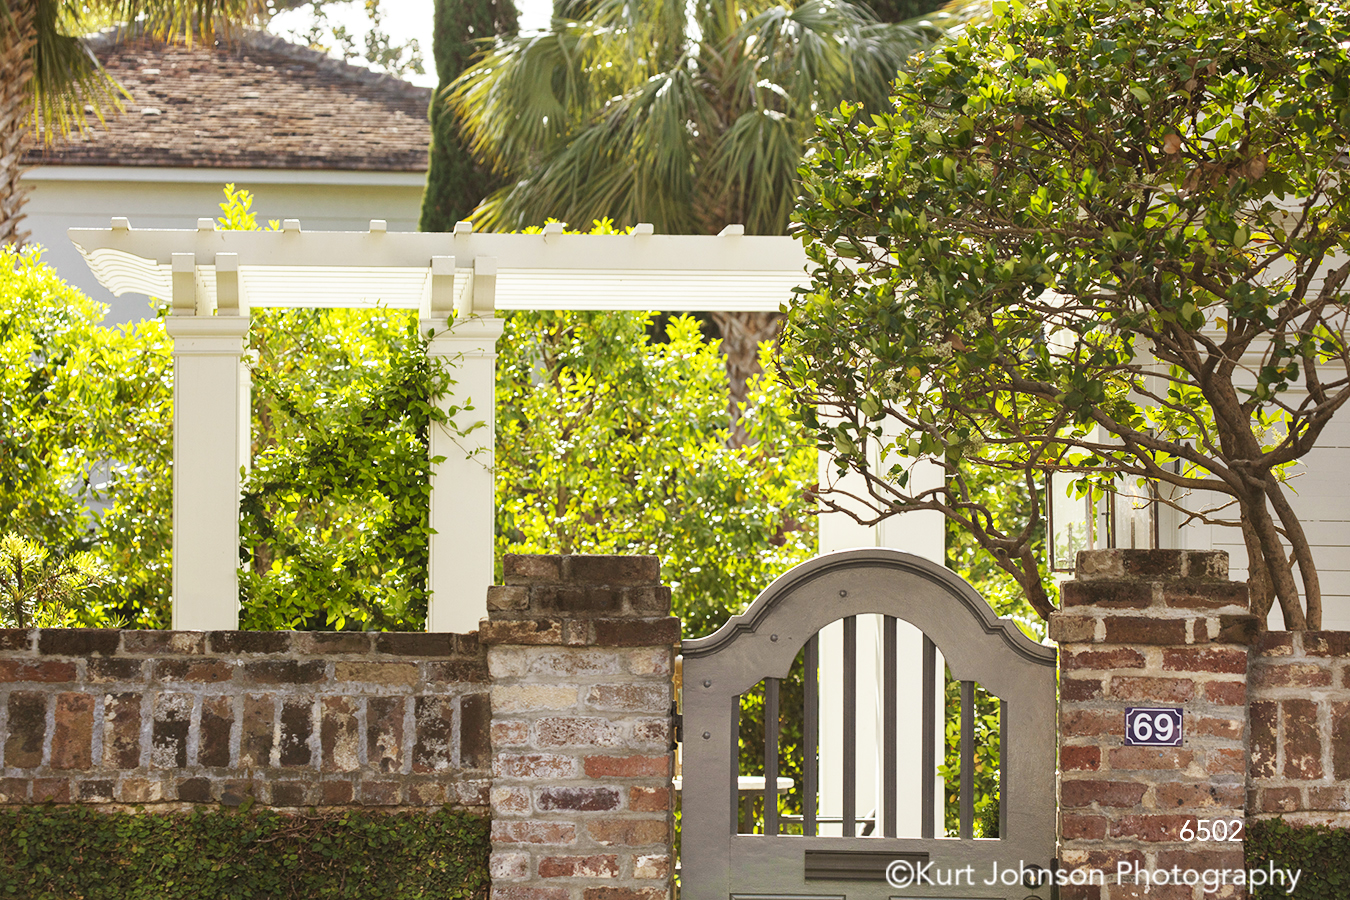 southeast Charleston South Carolina green tree trees red brick gate architecture city